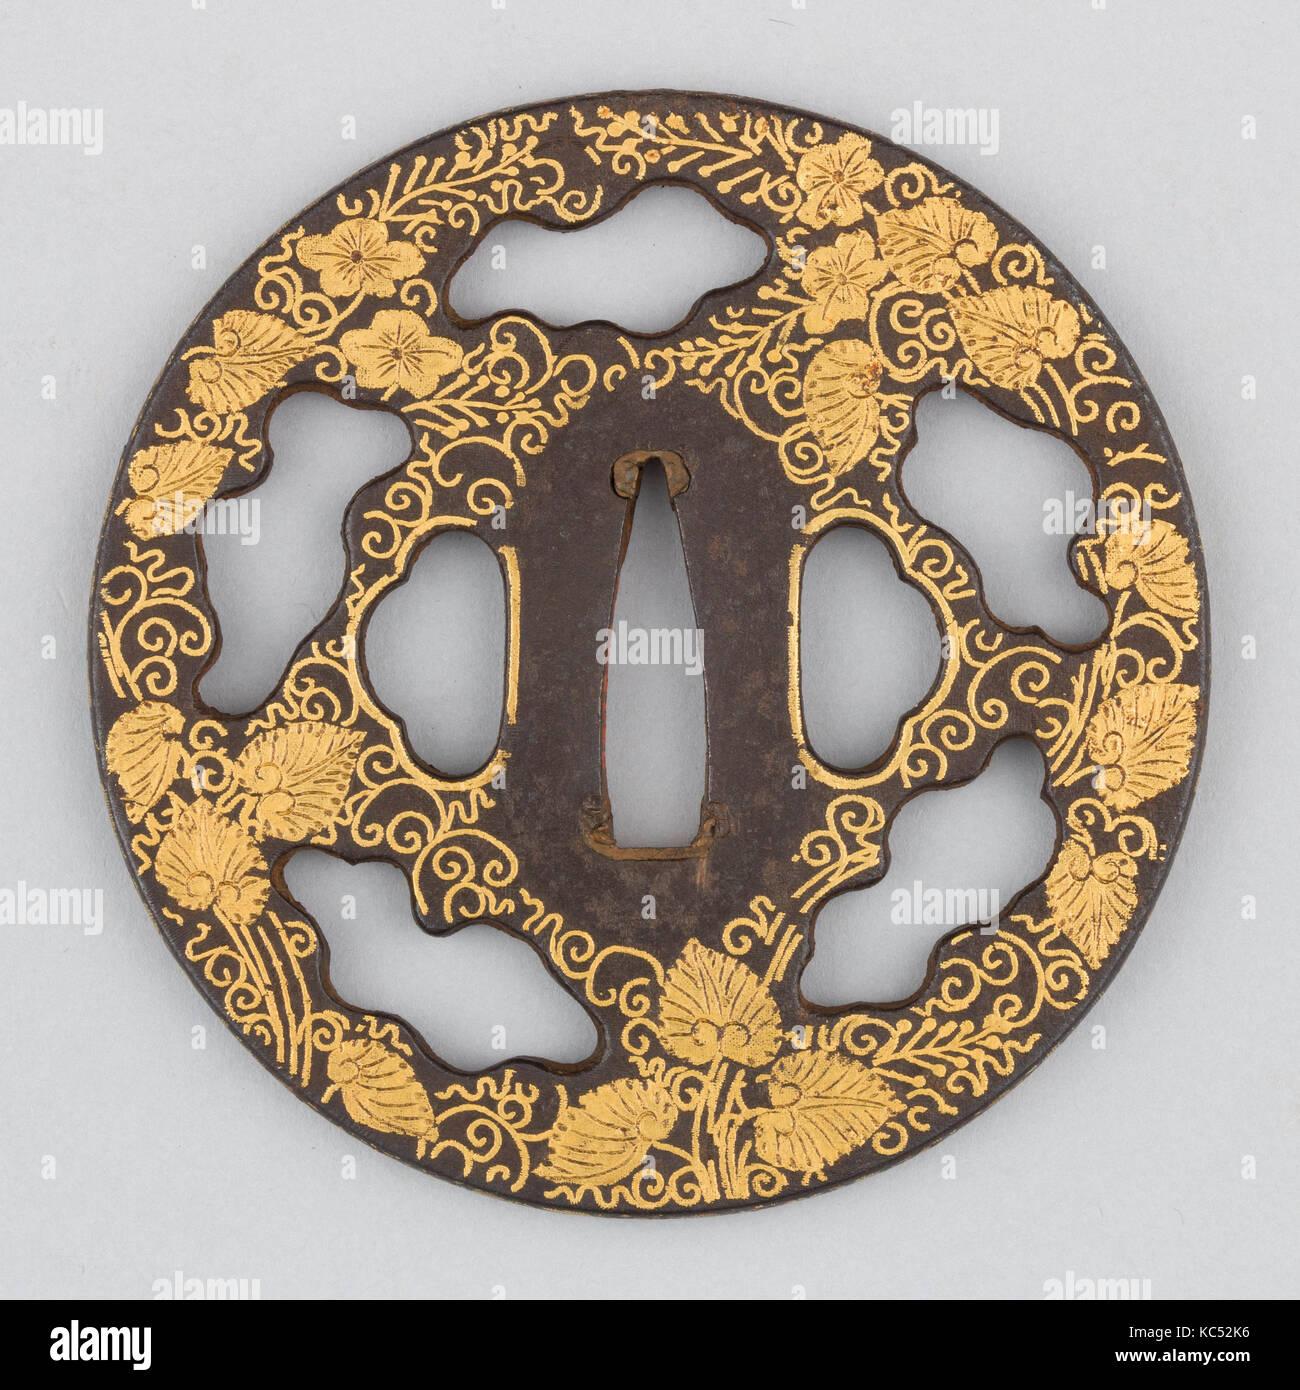 Sword guard tsuba 17th century japanese iron gold copper sword guard tsuba 17th century japanese iron gold copper diam 3 316 in 81 cm thickness 316 in 05 cm wt 48 buycottarizona Image collections